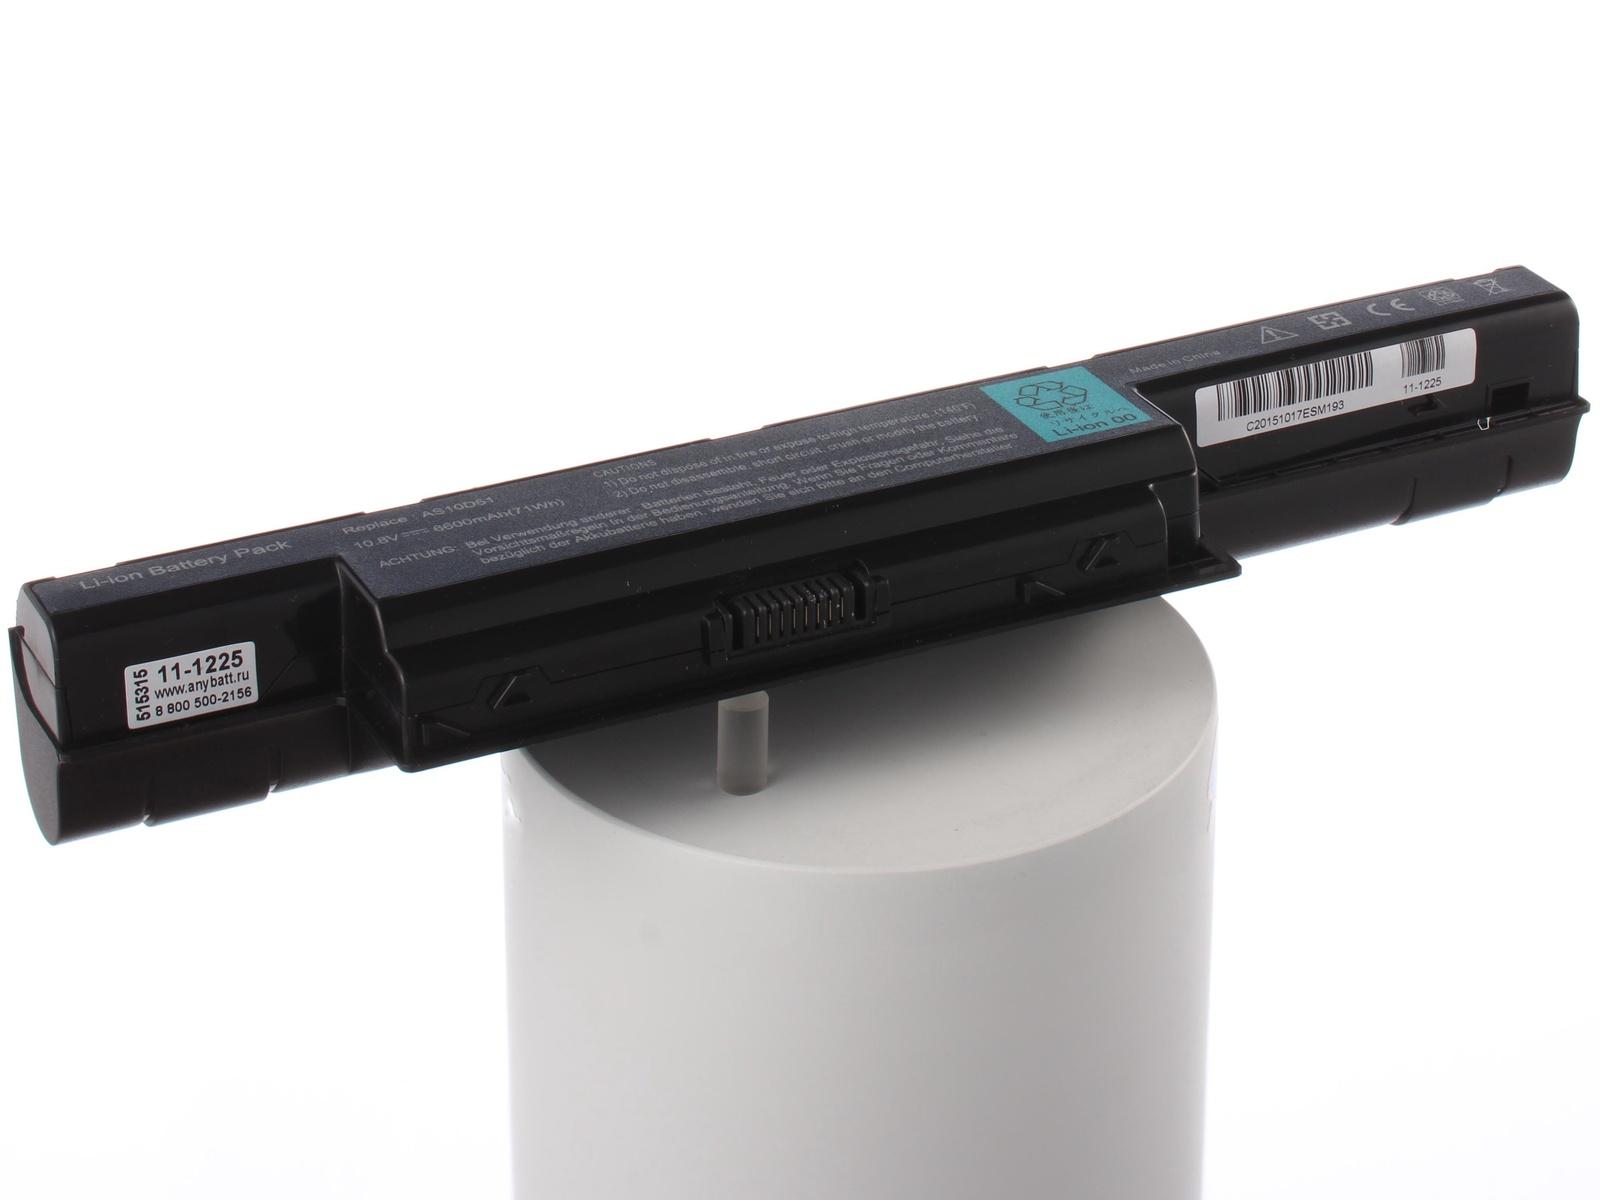 Аккумулятор для ноутбука AnyBatt для Acer Aspire E1-510-29202G32Mnkk, Aspire E1-571G-33126G50Mnks, Aspire E1-571G-53236G75Mn, Aspire V3-571G-53236G75Makk, Aspire V3-771G-32356G50Makk, eMachines E644-E352G25Mikk стоимость